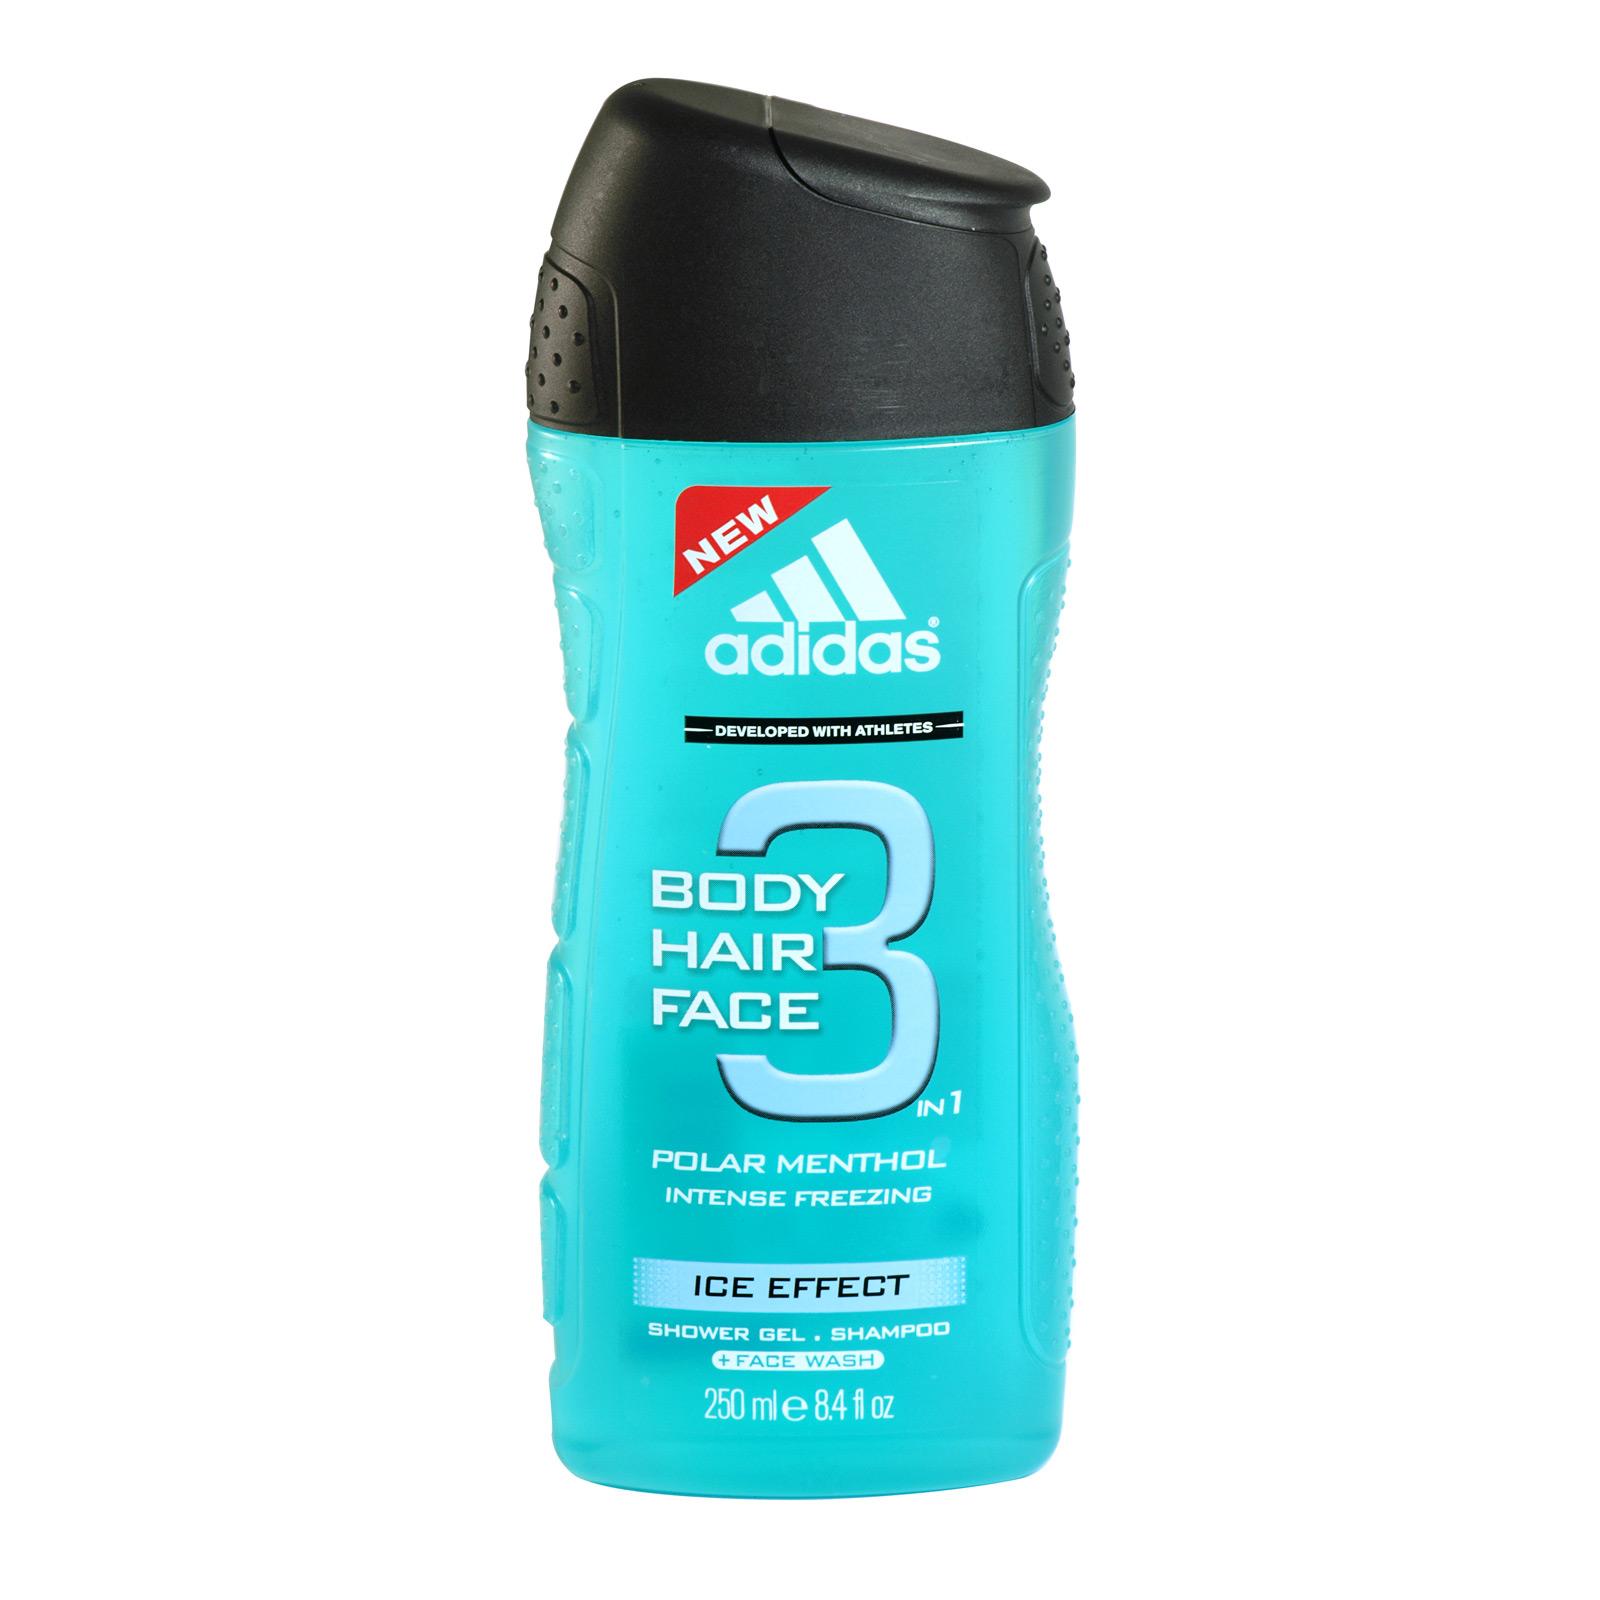 ADIDAS BODY+HAIR+FACE SHOWER GEL POLAR MENTHOL ICE EFFECT X6